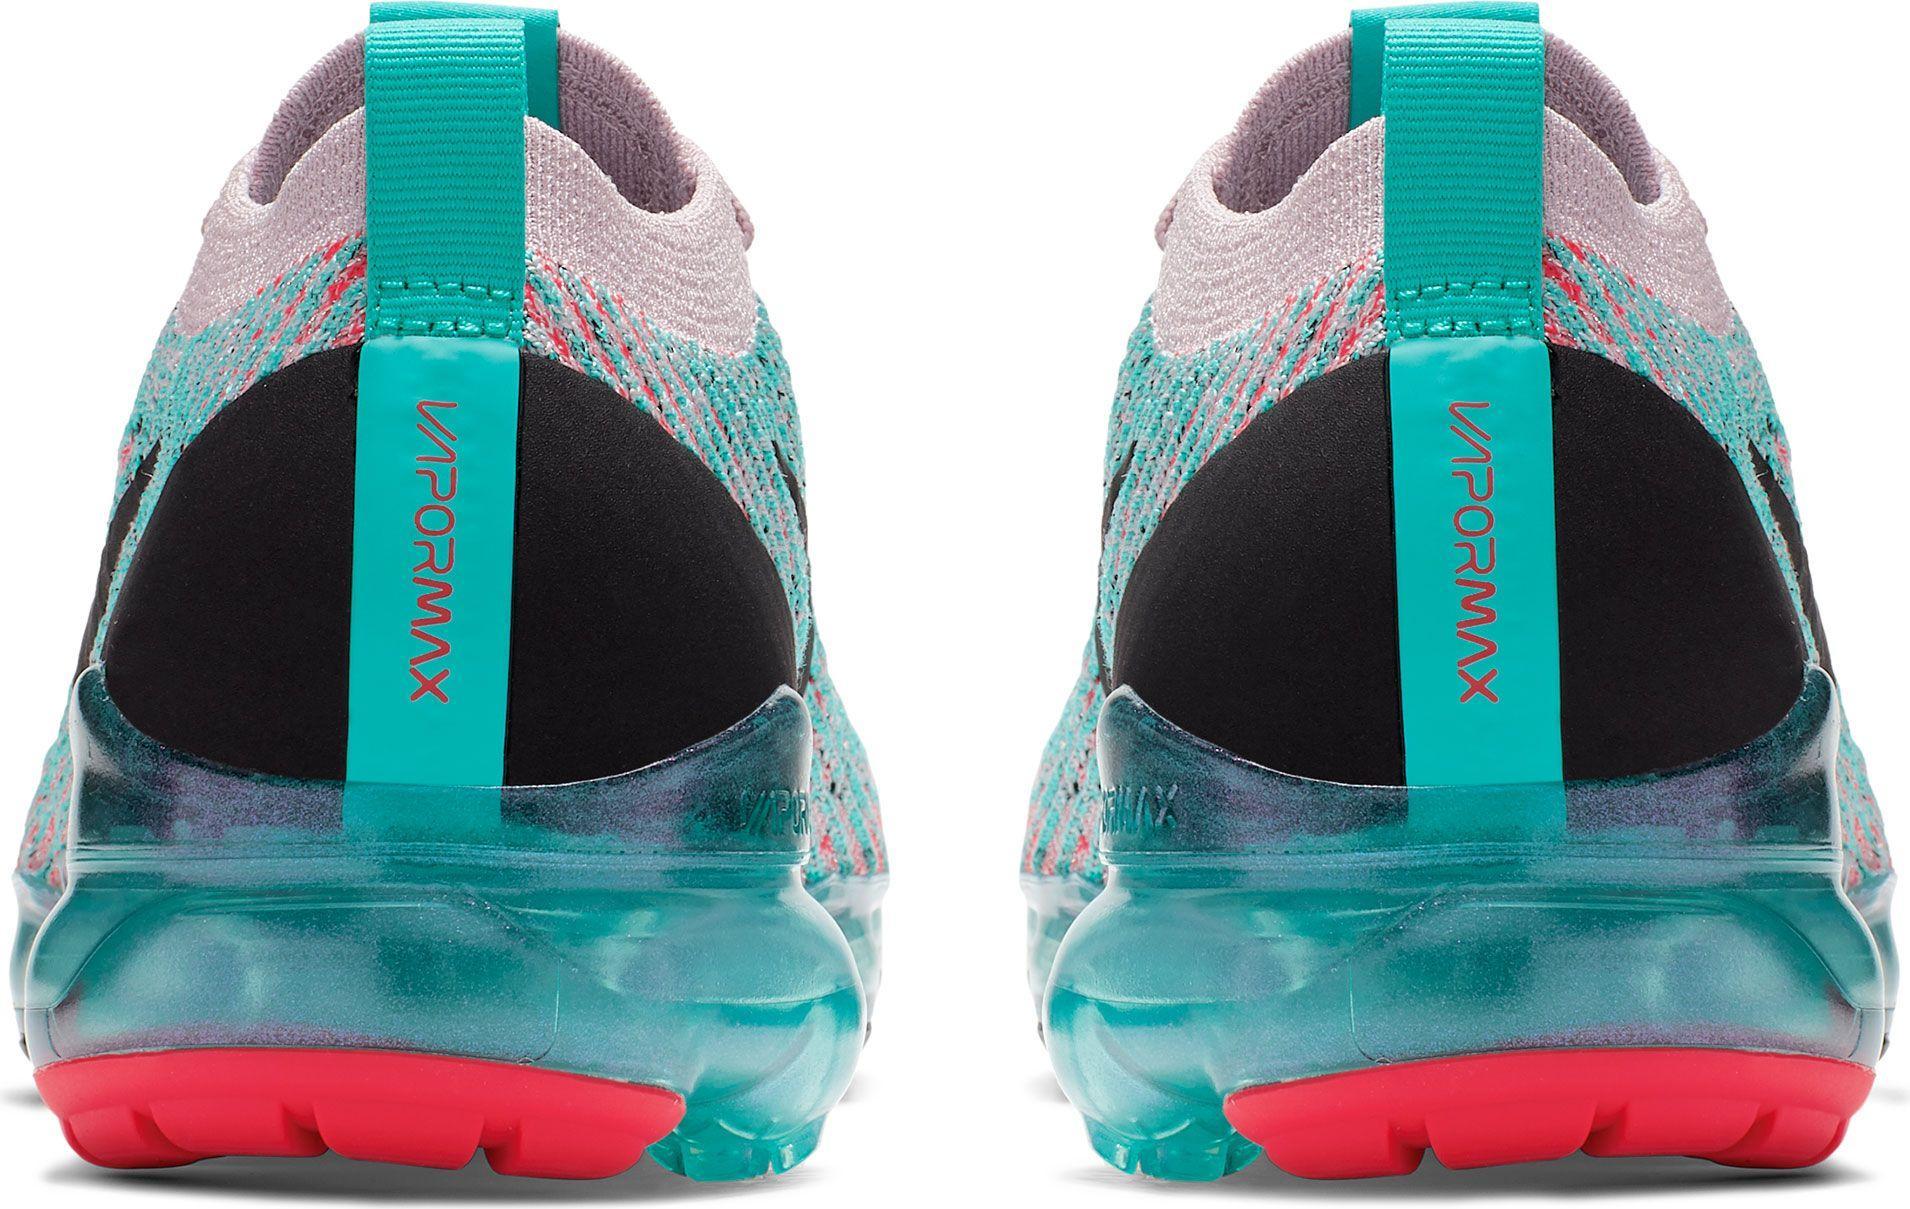 huge discount 7fb0b 584cd Women's Air Vapormax Flyknit 3 Shoes